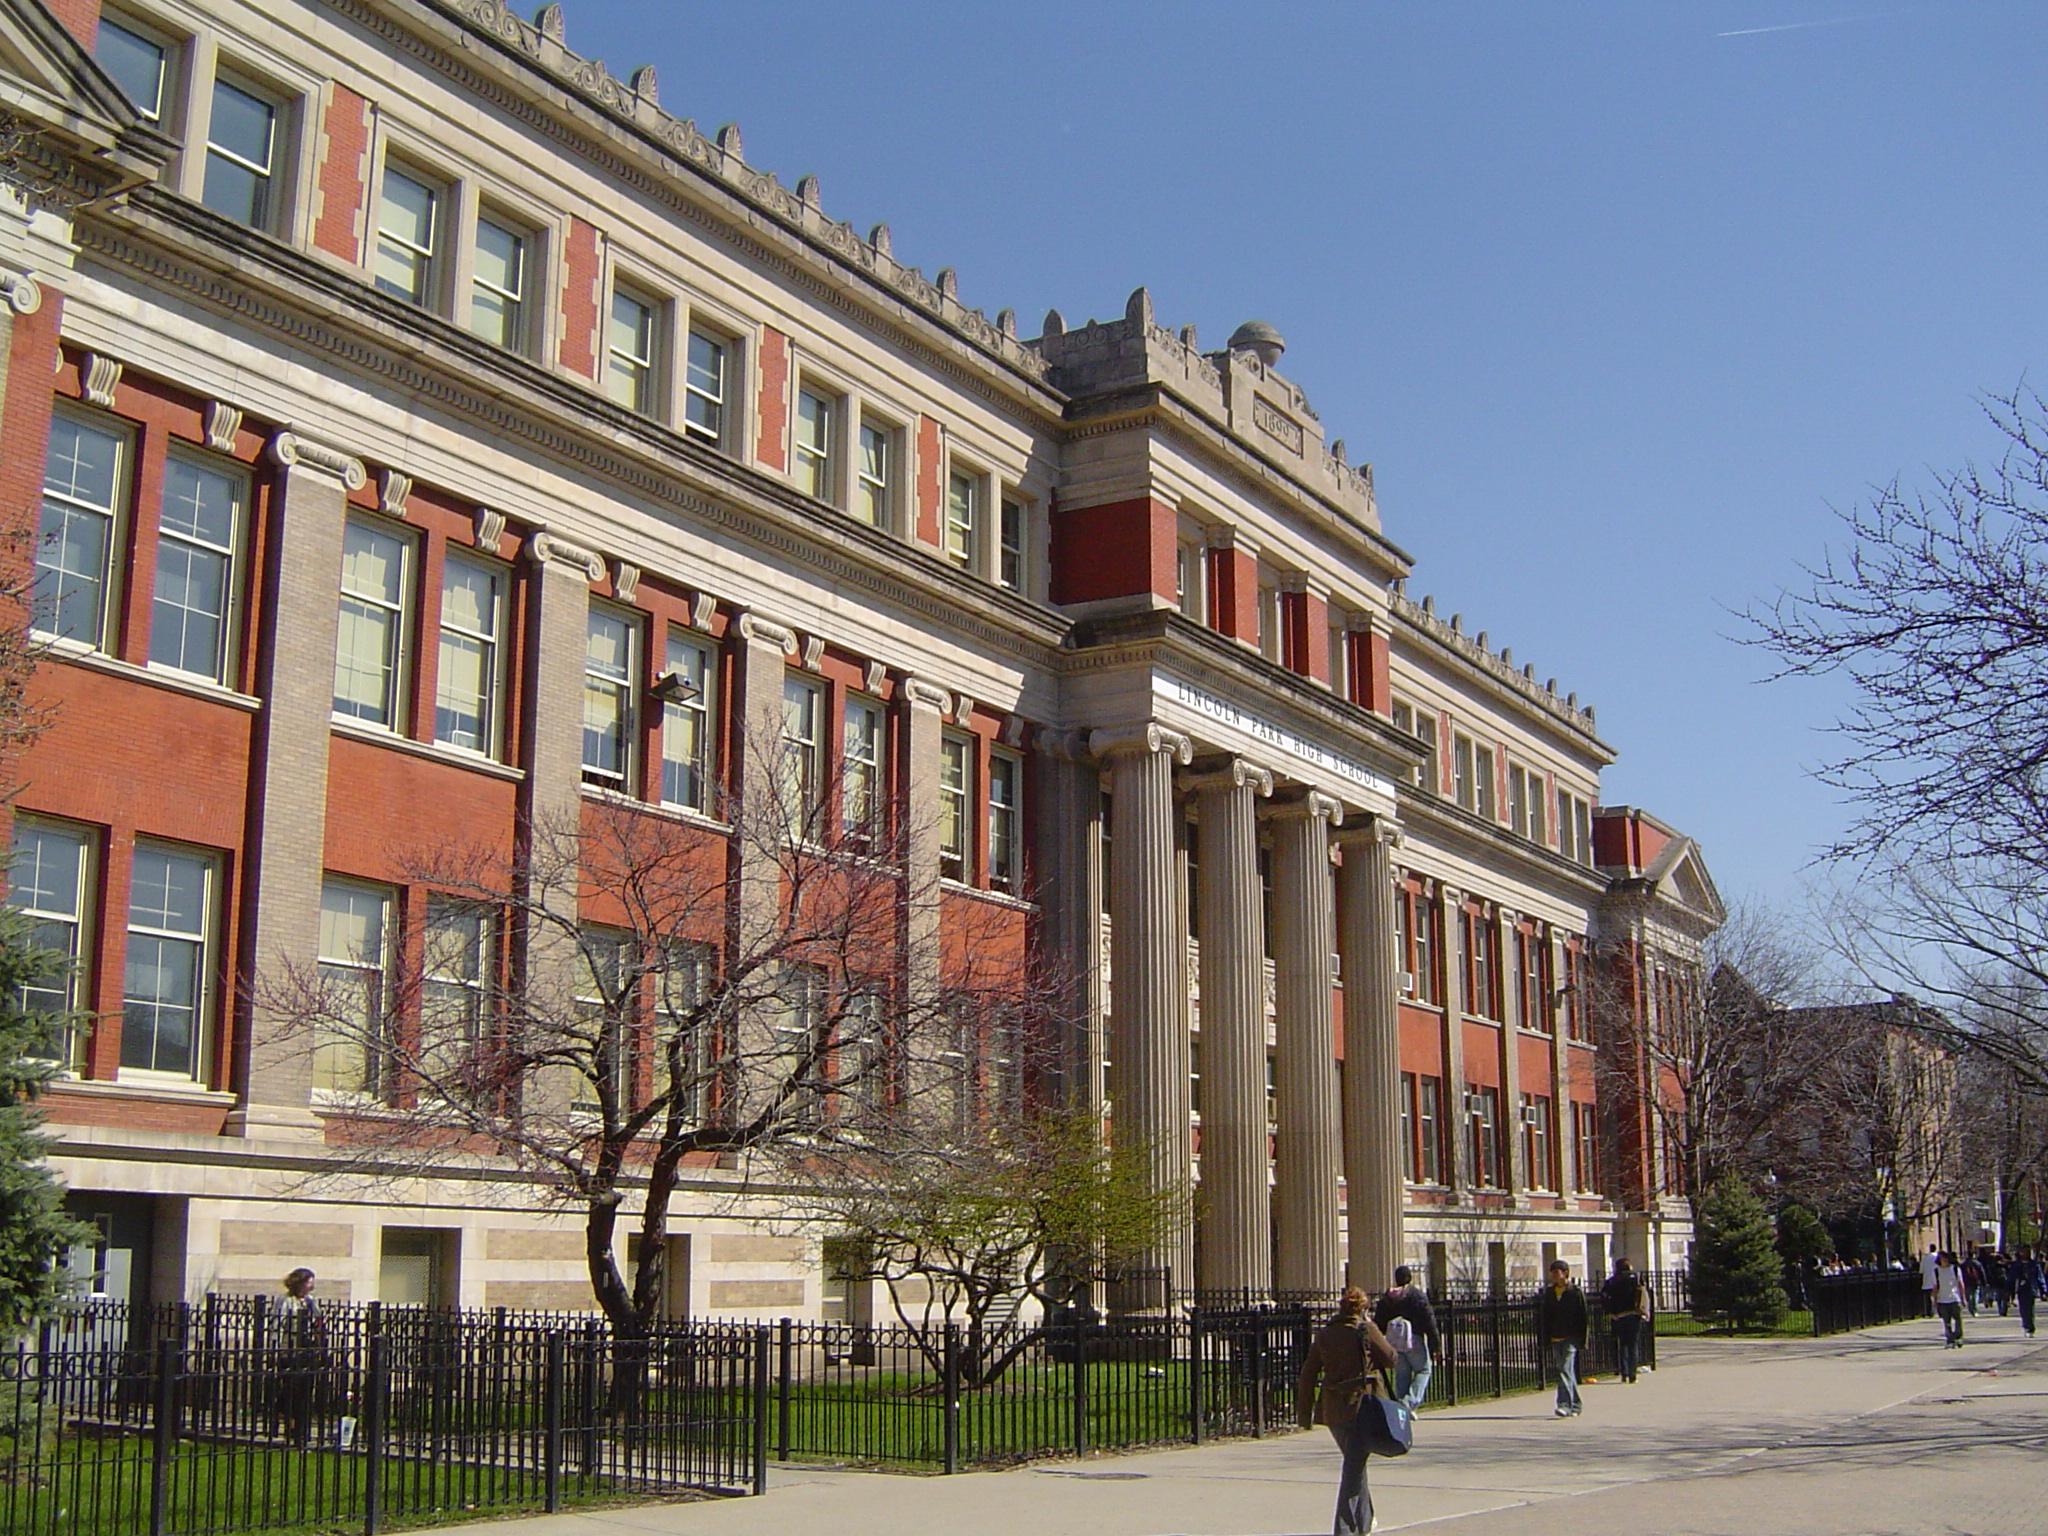 The Chicago School Project - Increasing inclusivity and understanding in schools.